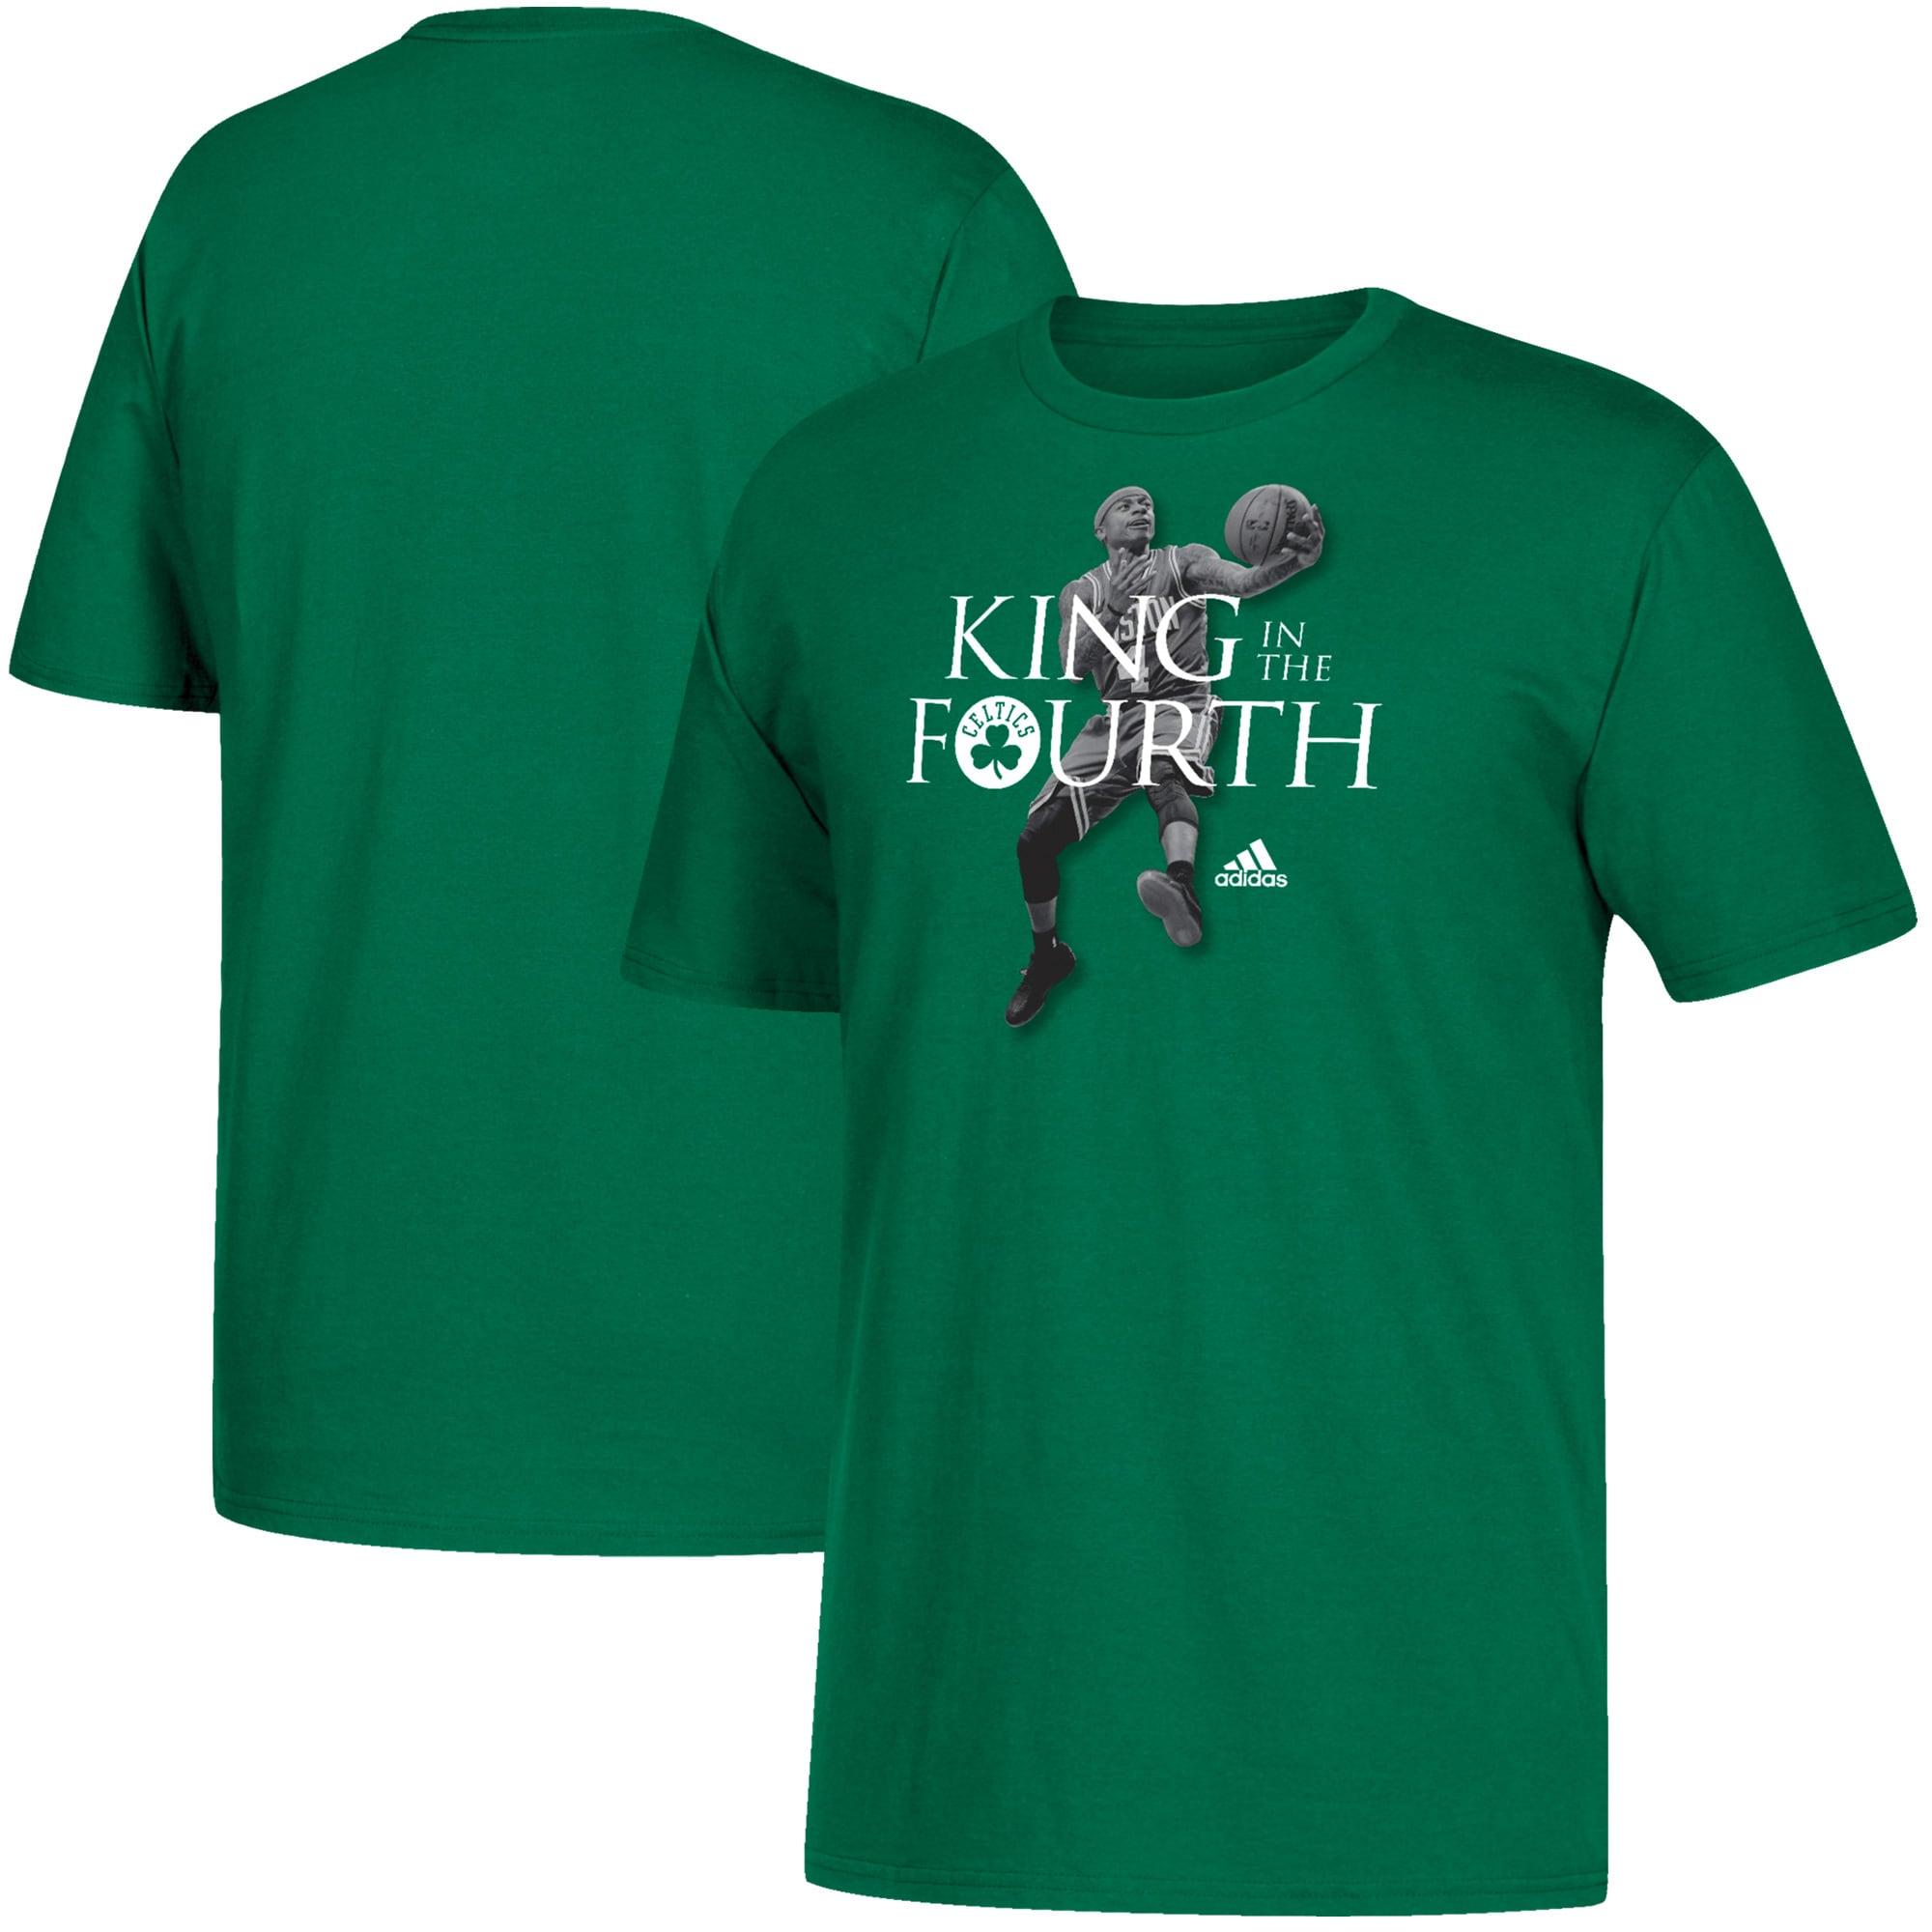 Isaiah Thomas Boston Celtics adidas King in the Fourth T-Shirt - Kelly Green